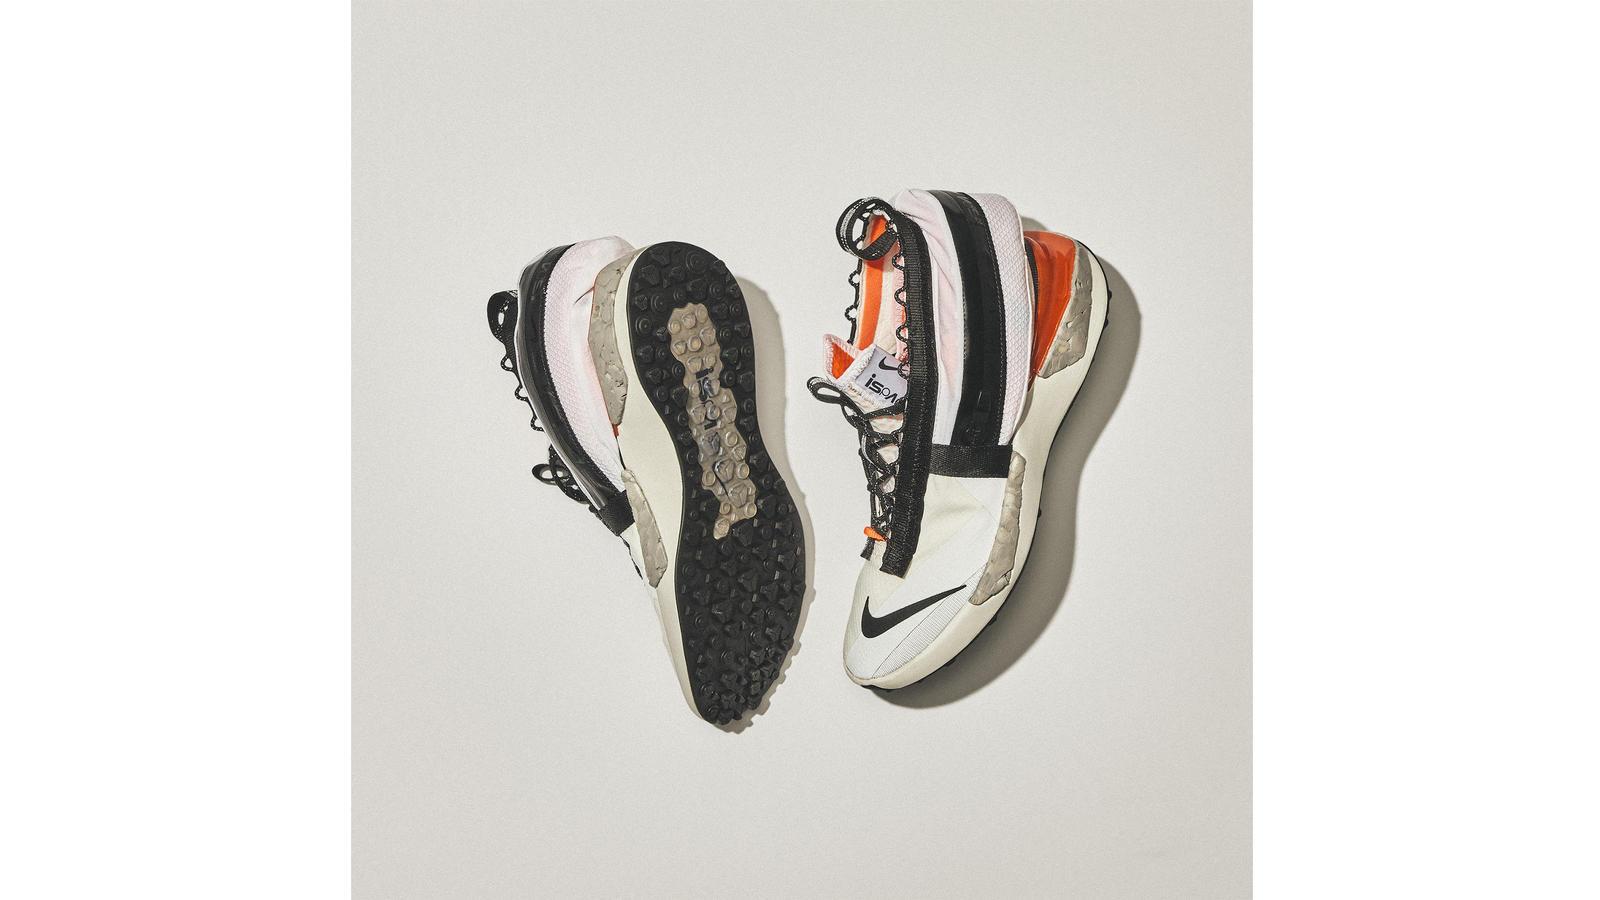 Nike ISPA Drifter Gator 5